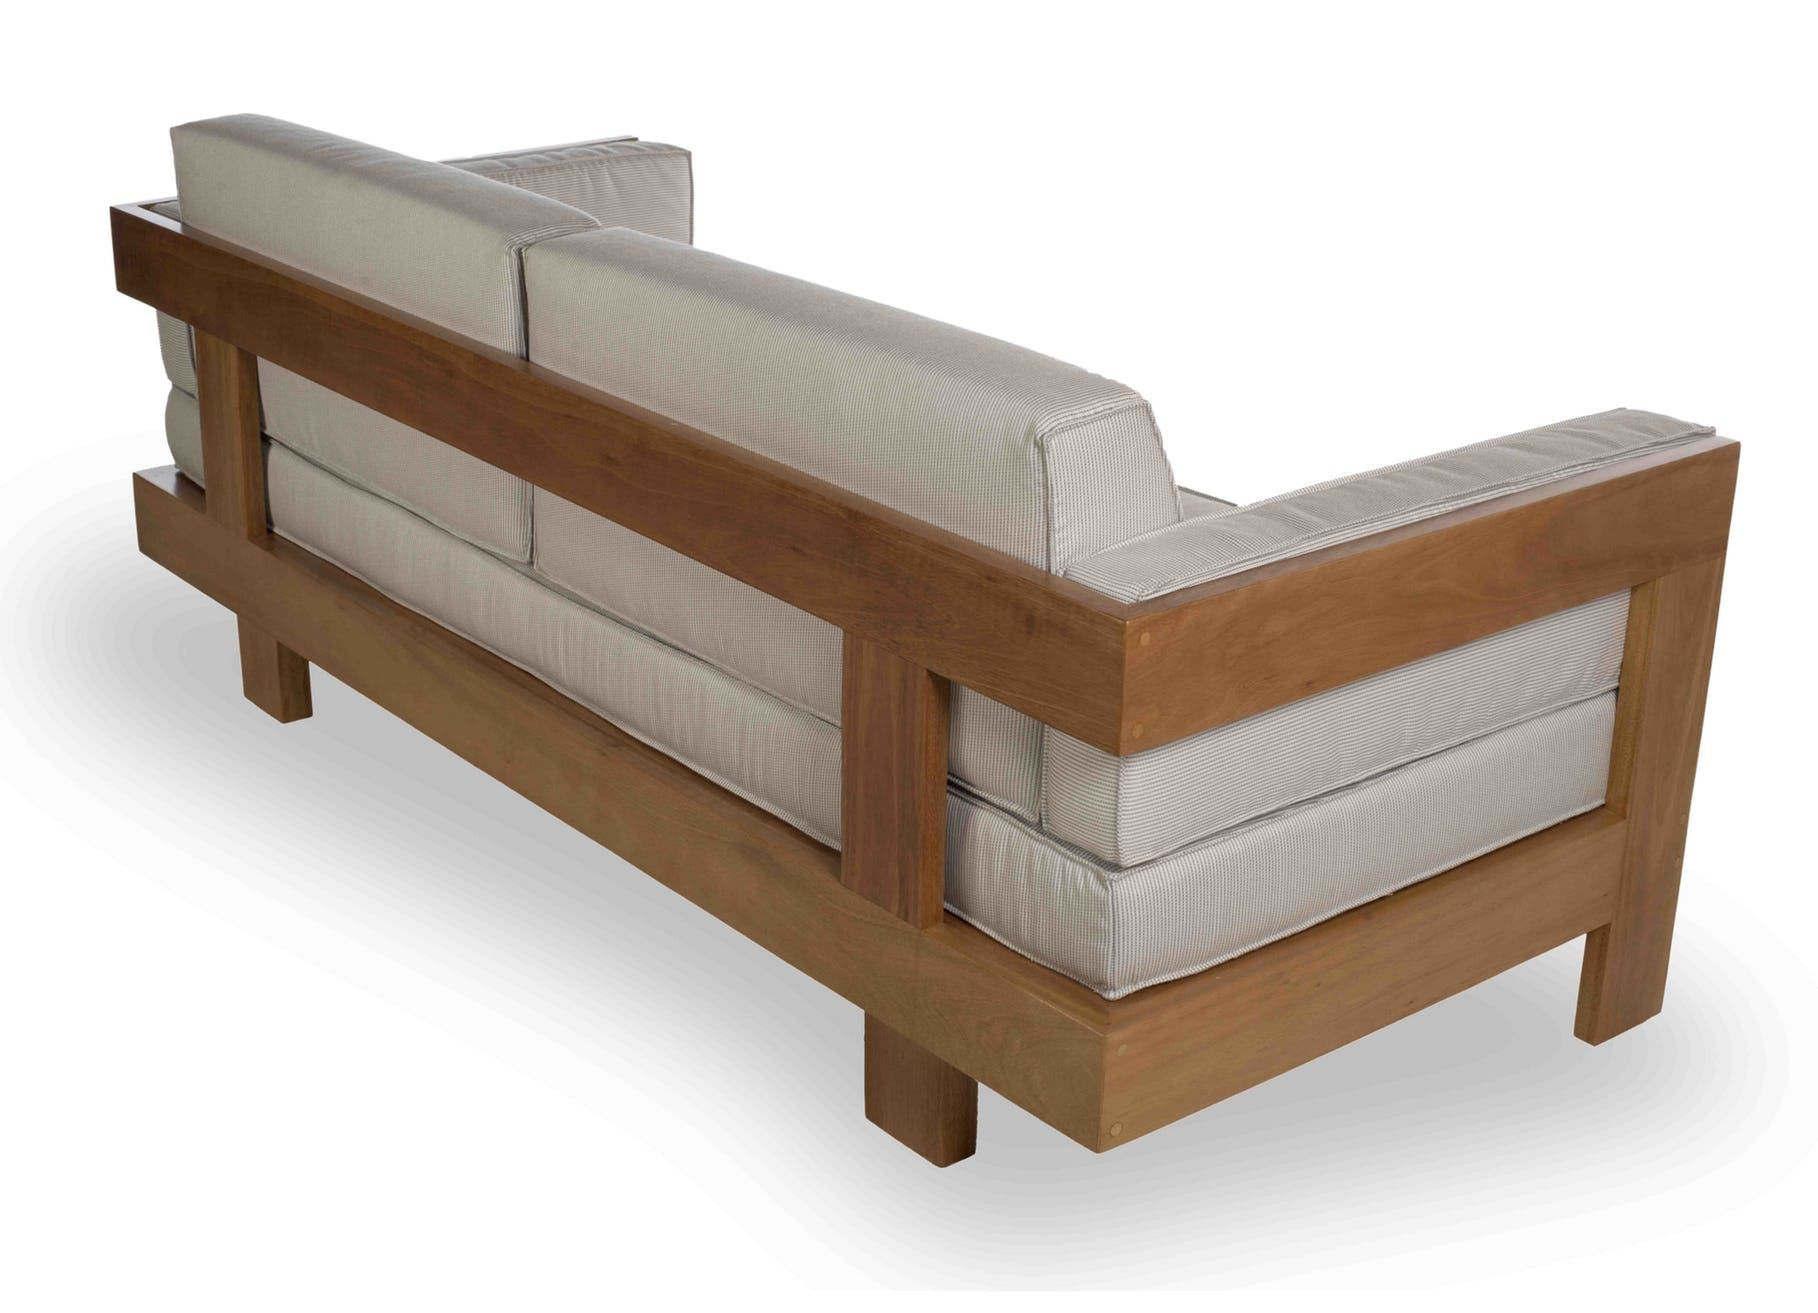 Pin Von Mery Arias Auf Mobilya In 2020 Sofa Design Holzsofa Sofa Set Designs